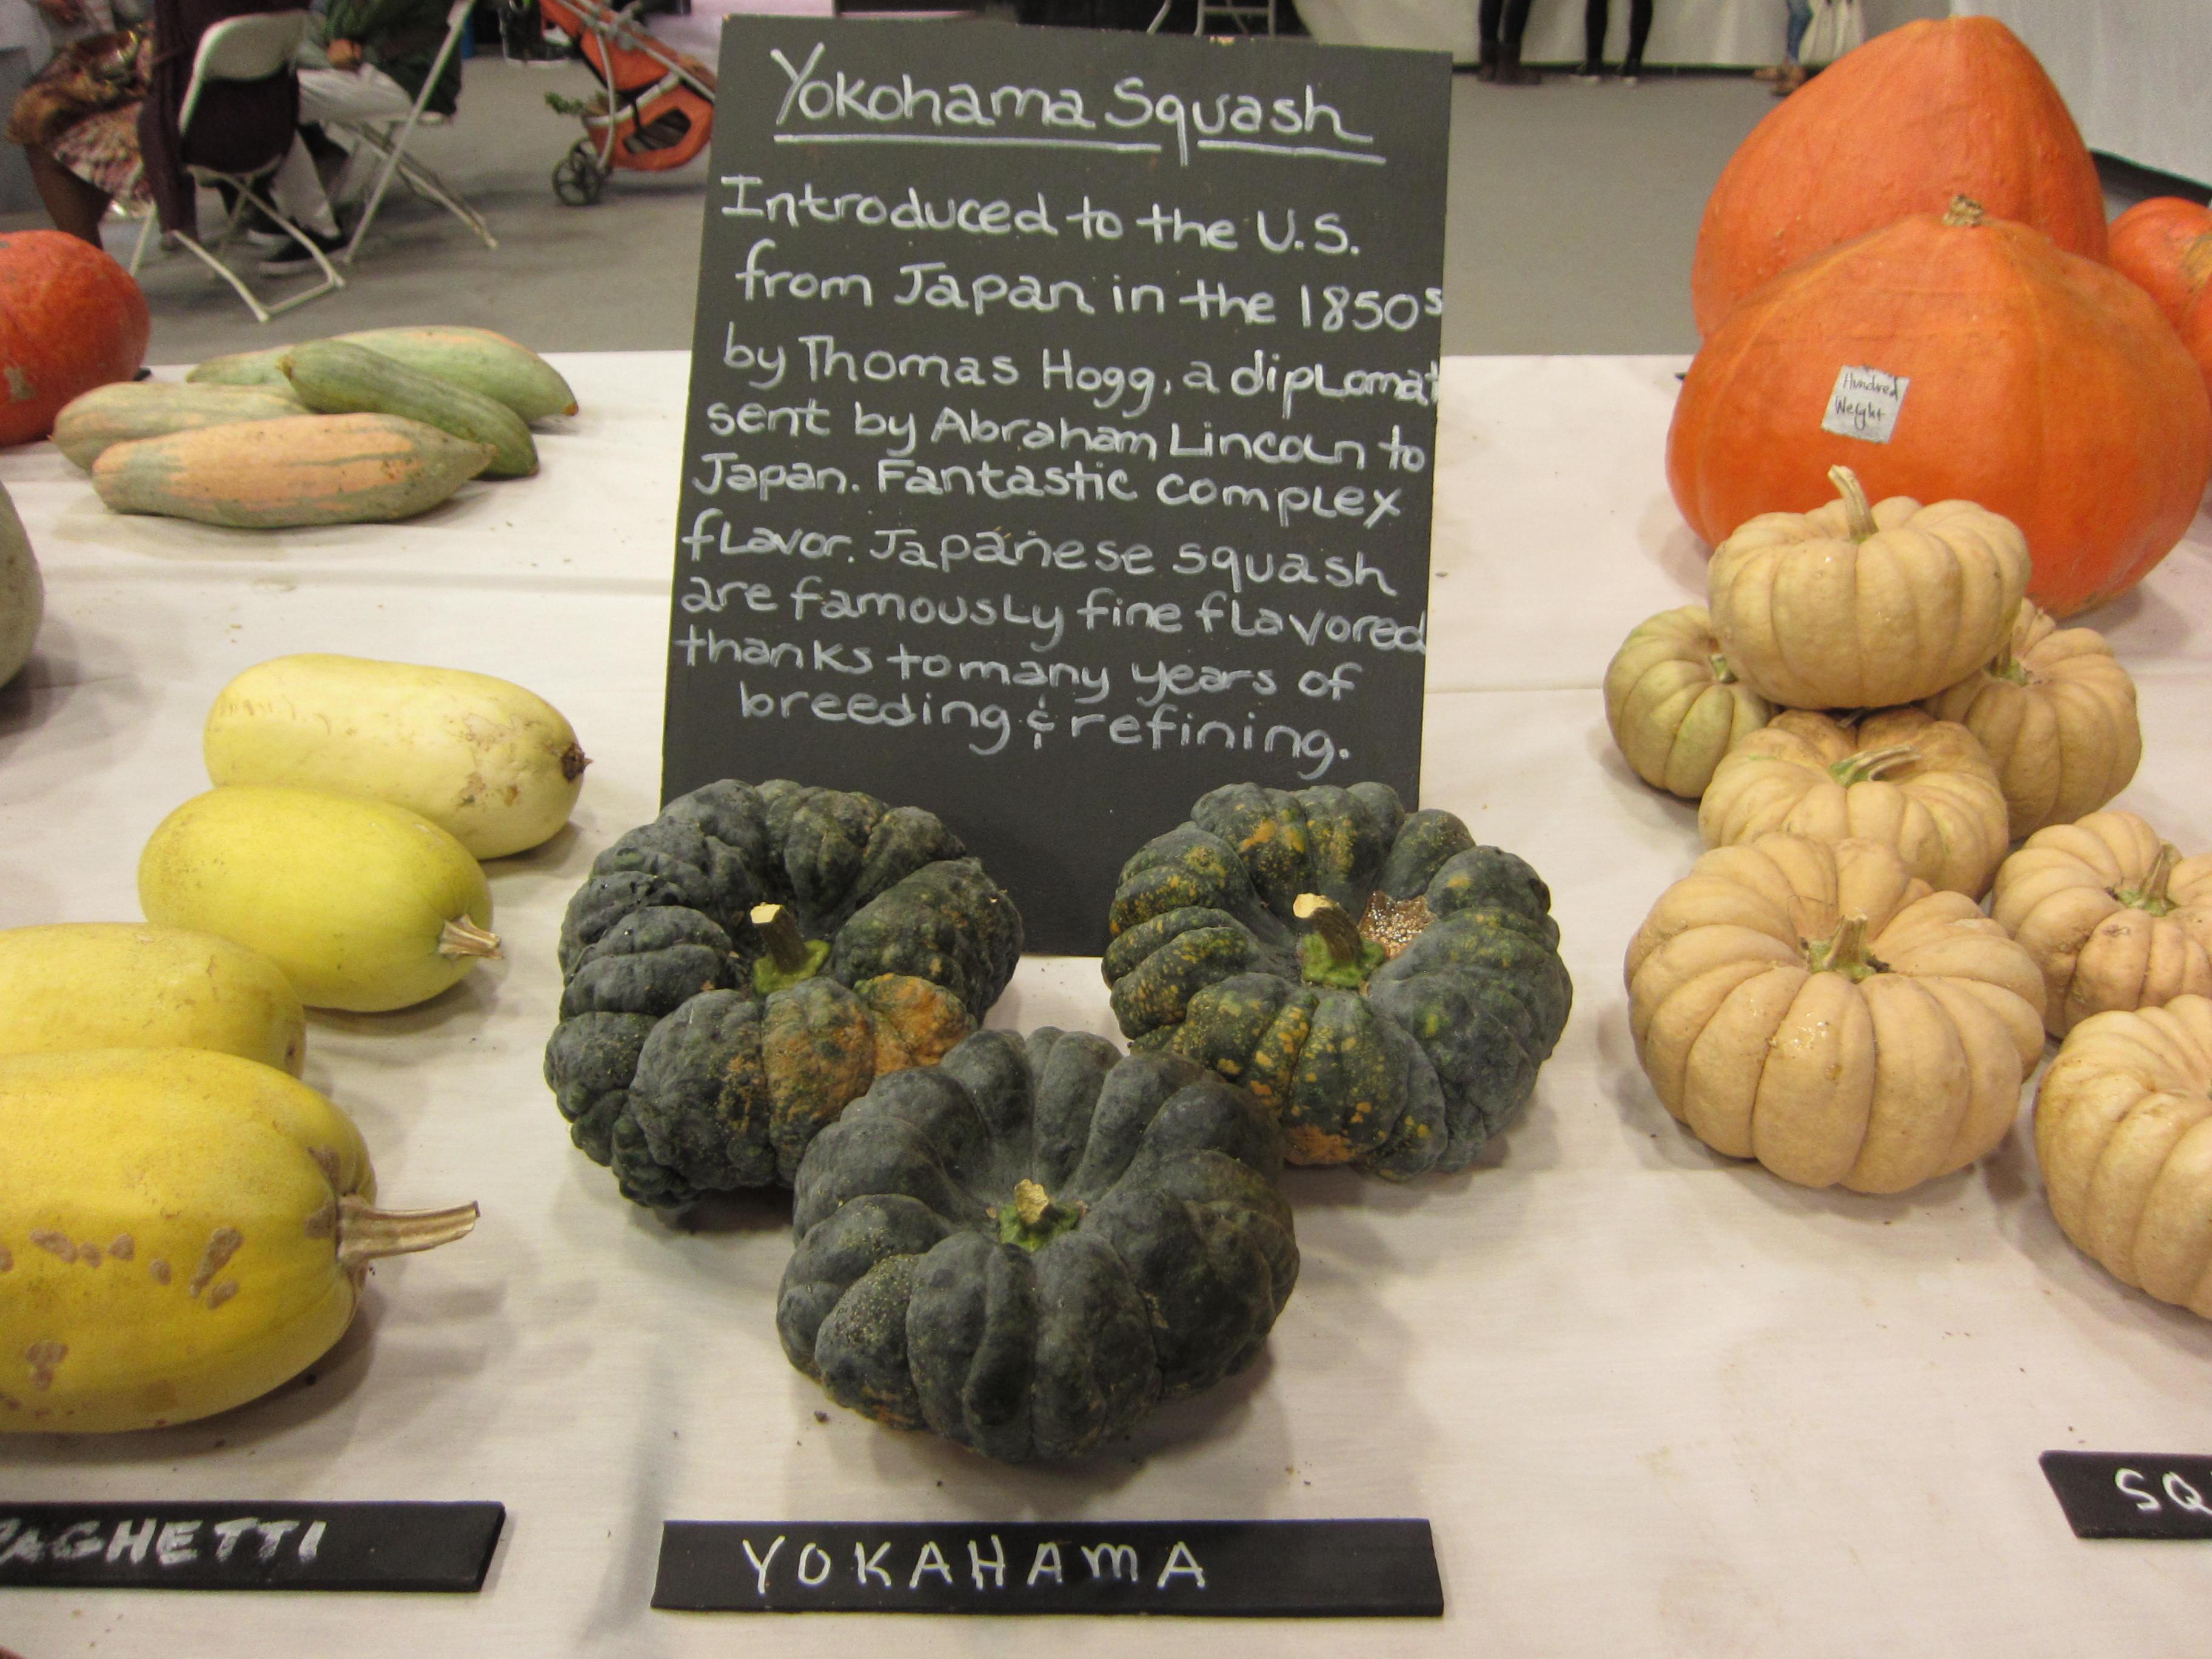 Heirloom Expo Yokohama squash